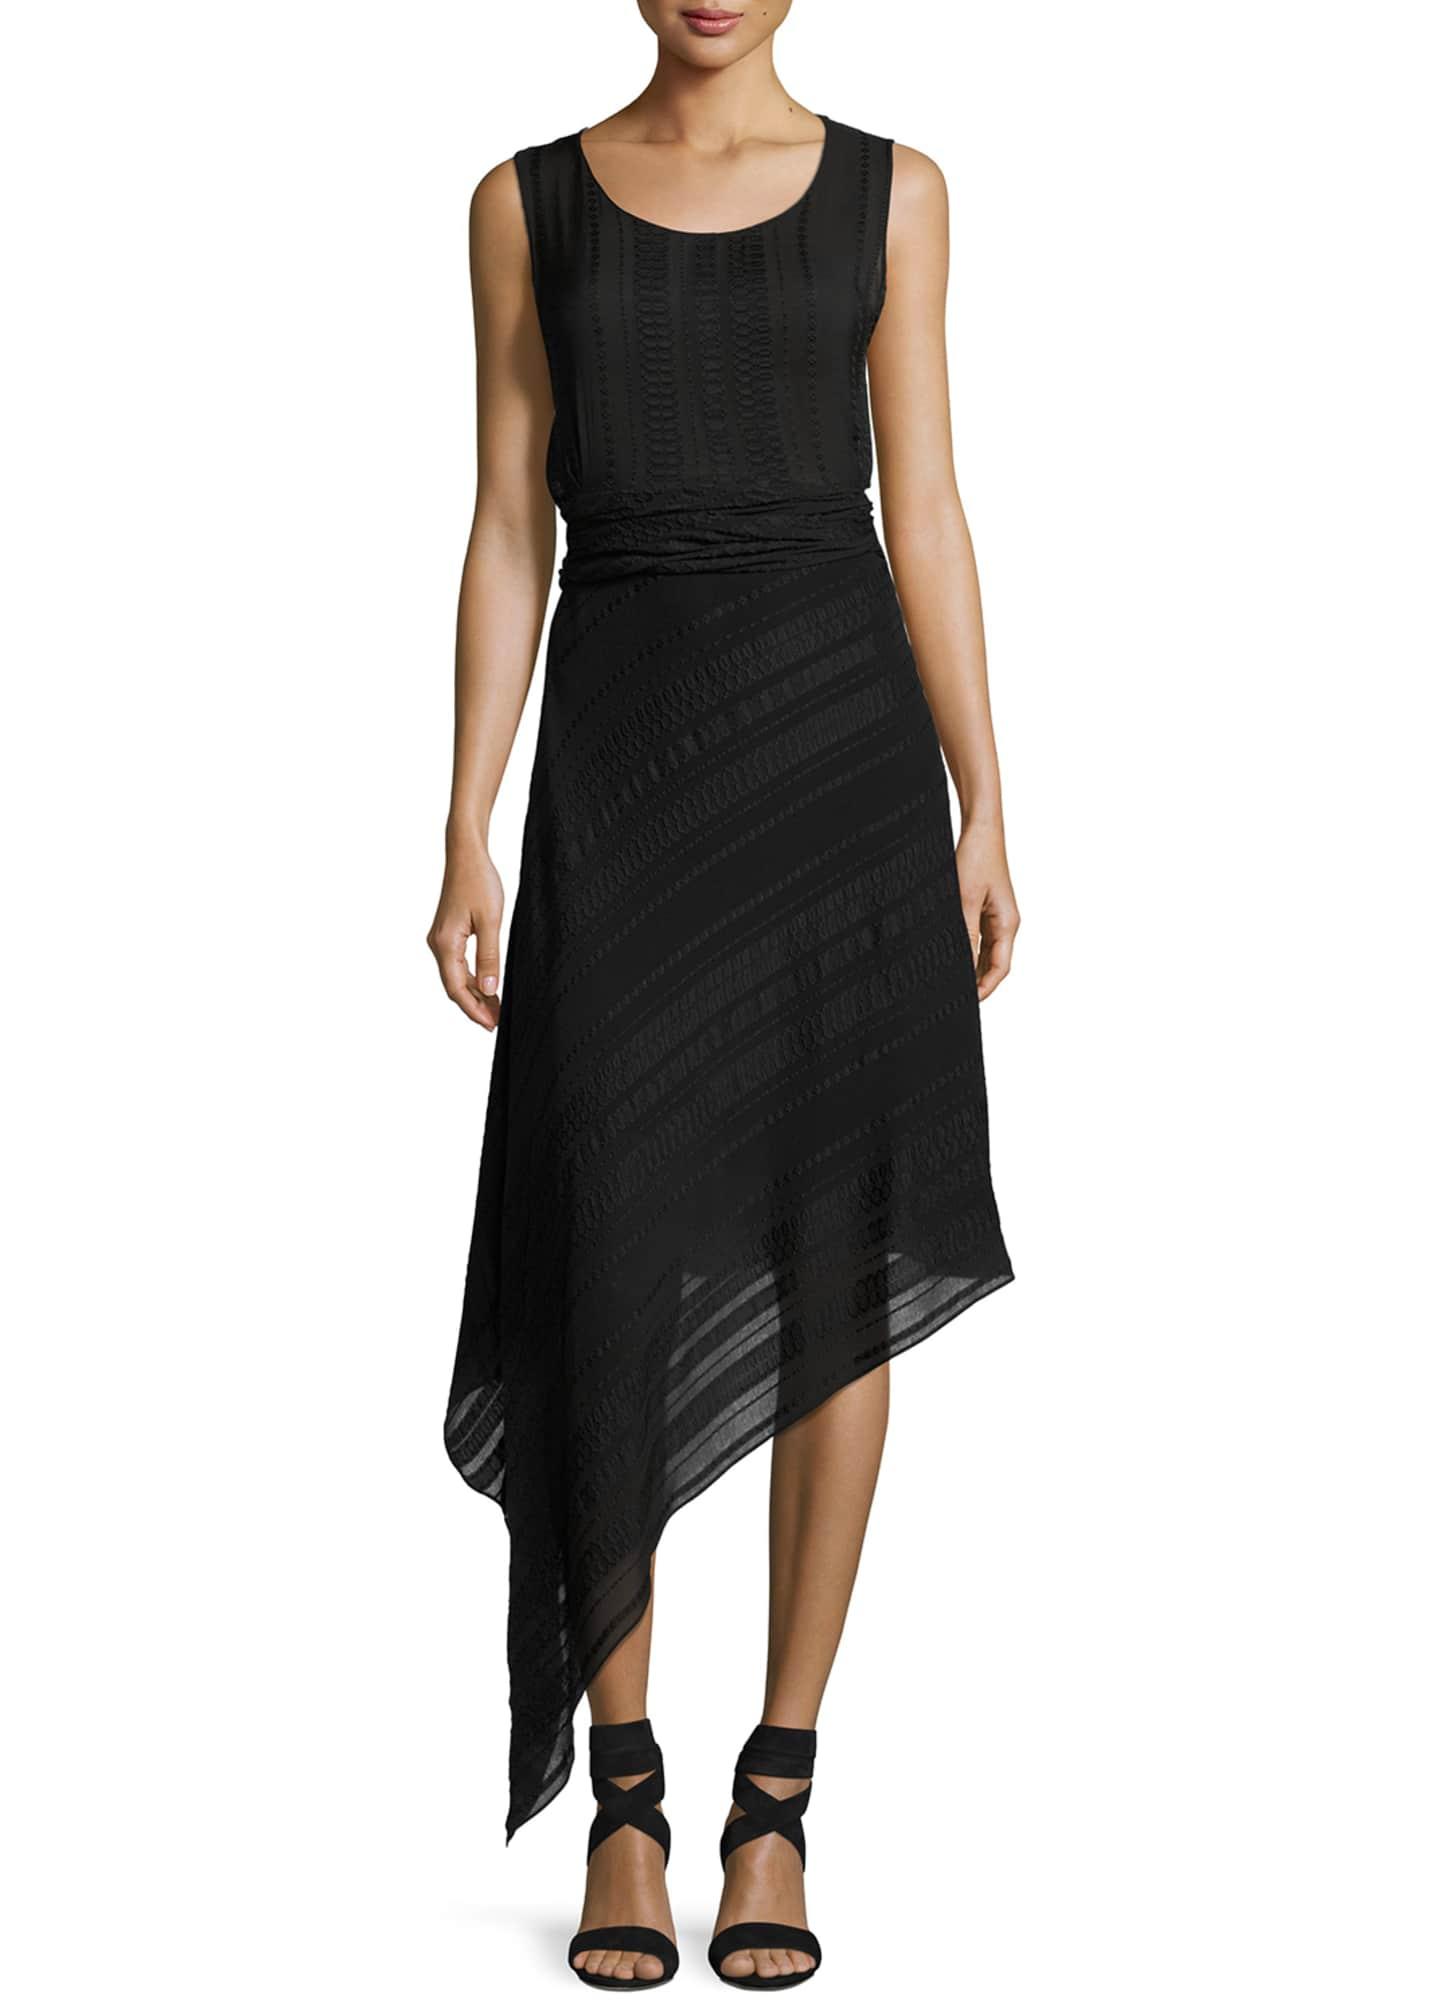 Zeus and Dione Asymmetric Scoop-Neck Midi Dress